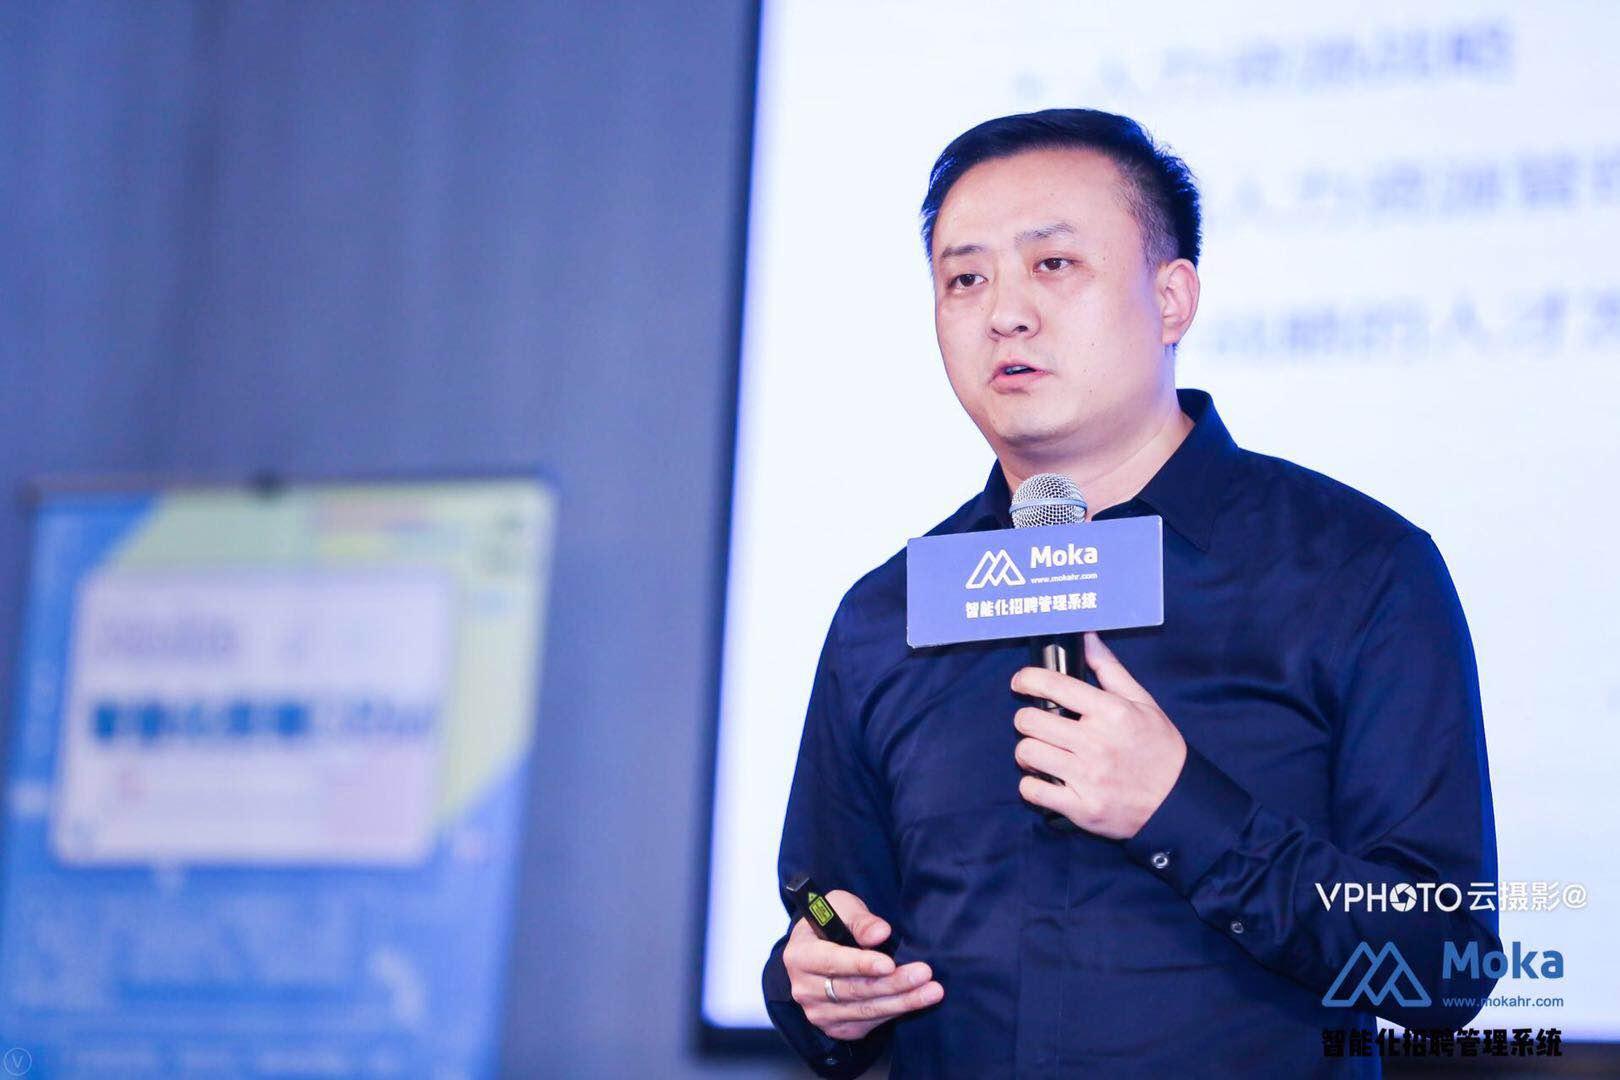 Moka招聘管理系统4月27日HR大咖汇上海站成功举办摩卡研习社-Moka智能化招聘系统